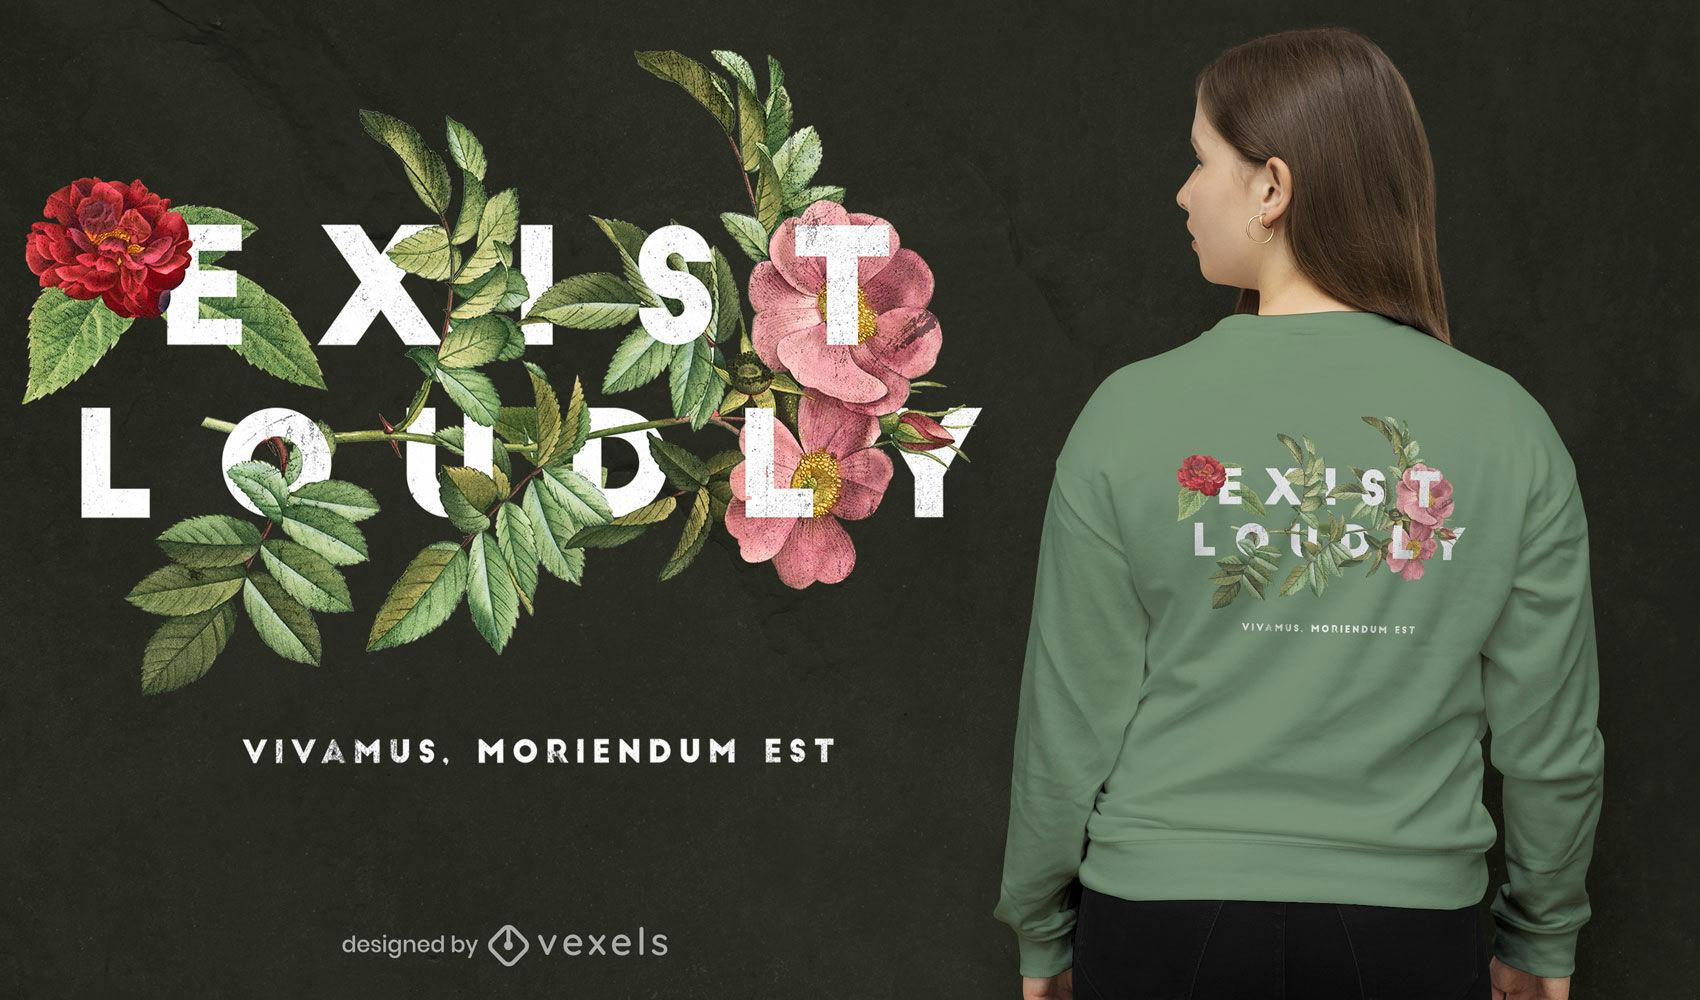 Exist loudly flowers psd t-shirt design